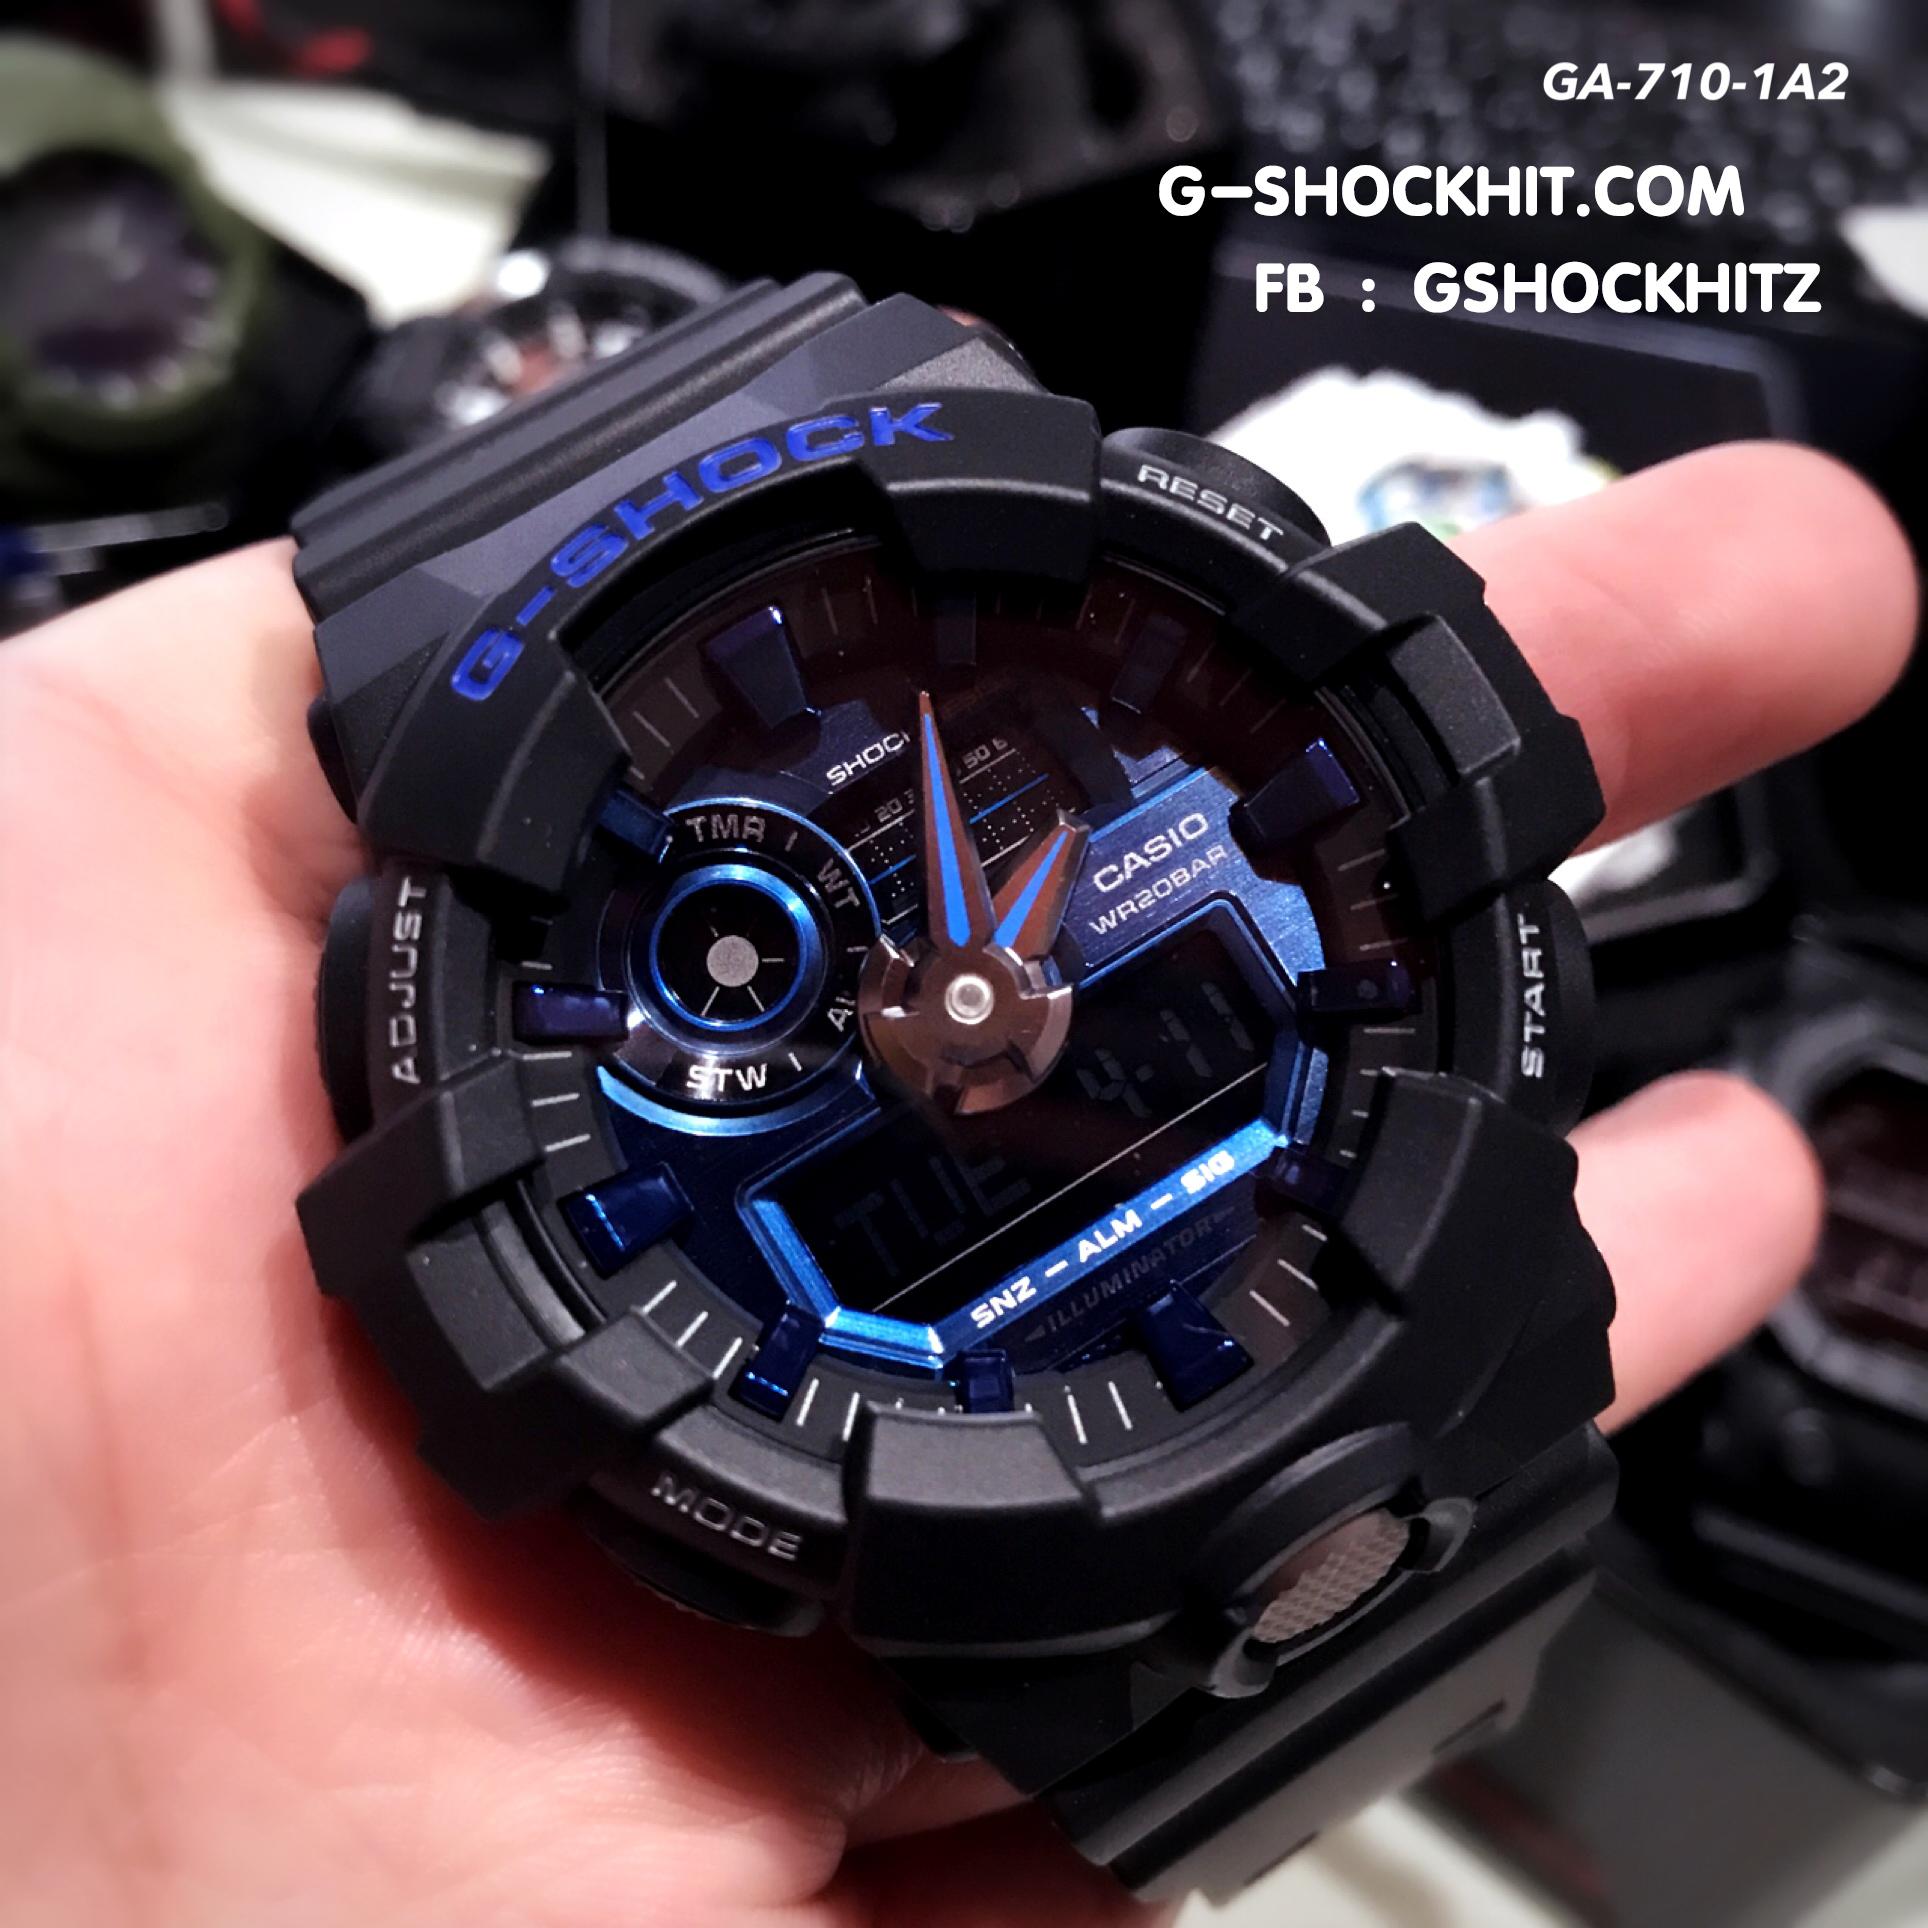 low priced 56158 1da0c นาฬิกา CASIO G-SHOCK รุ่น GA-710-1A2 ของแท้ประกันศูนย์ CMG 1ปี